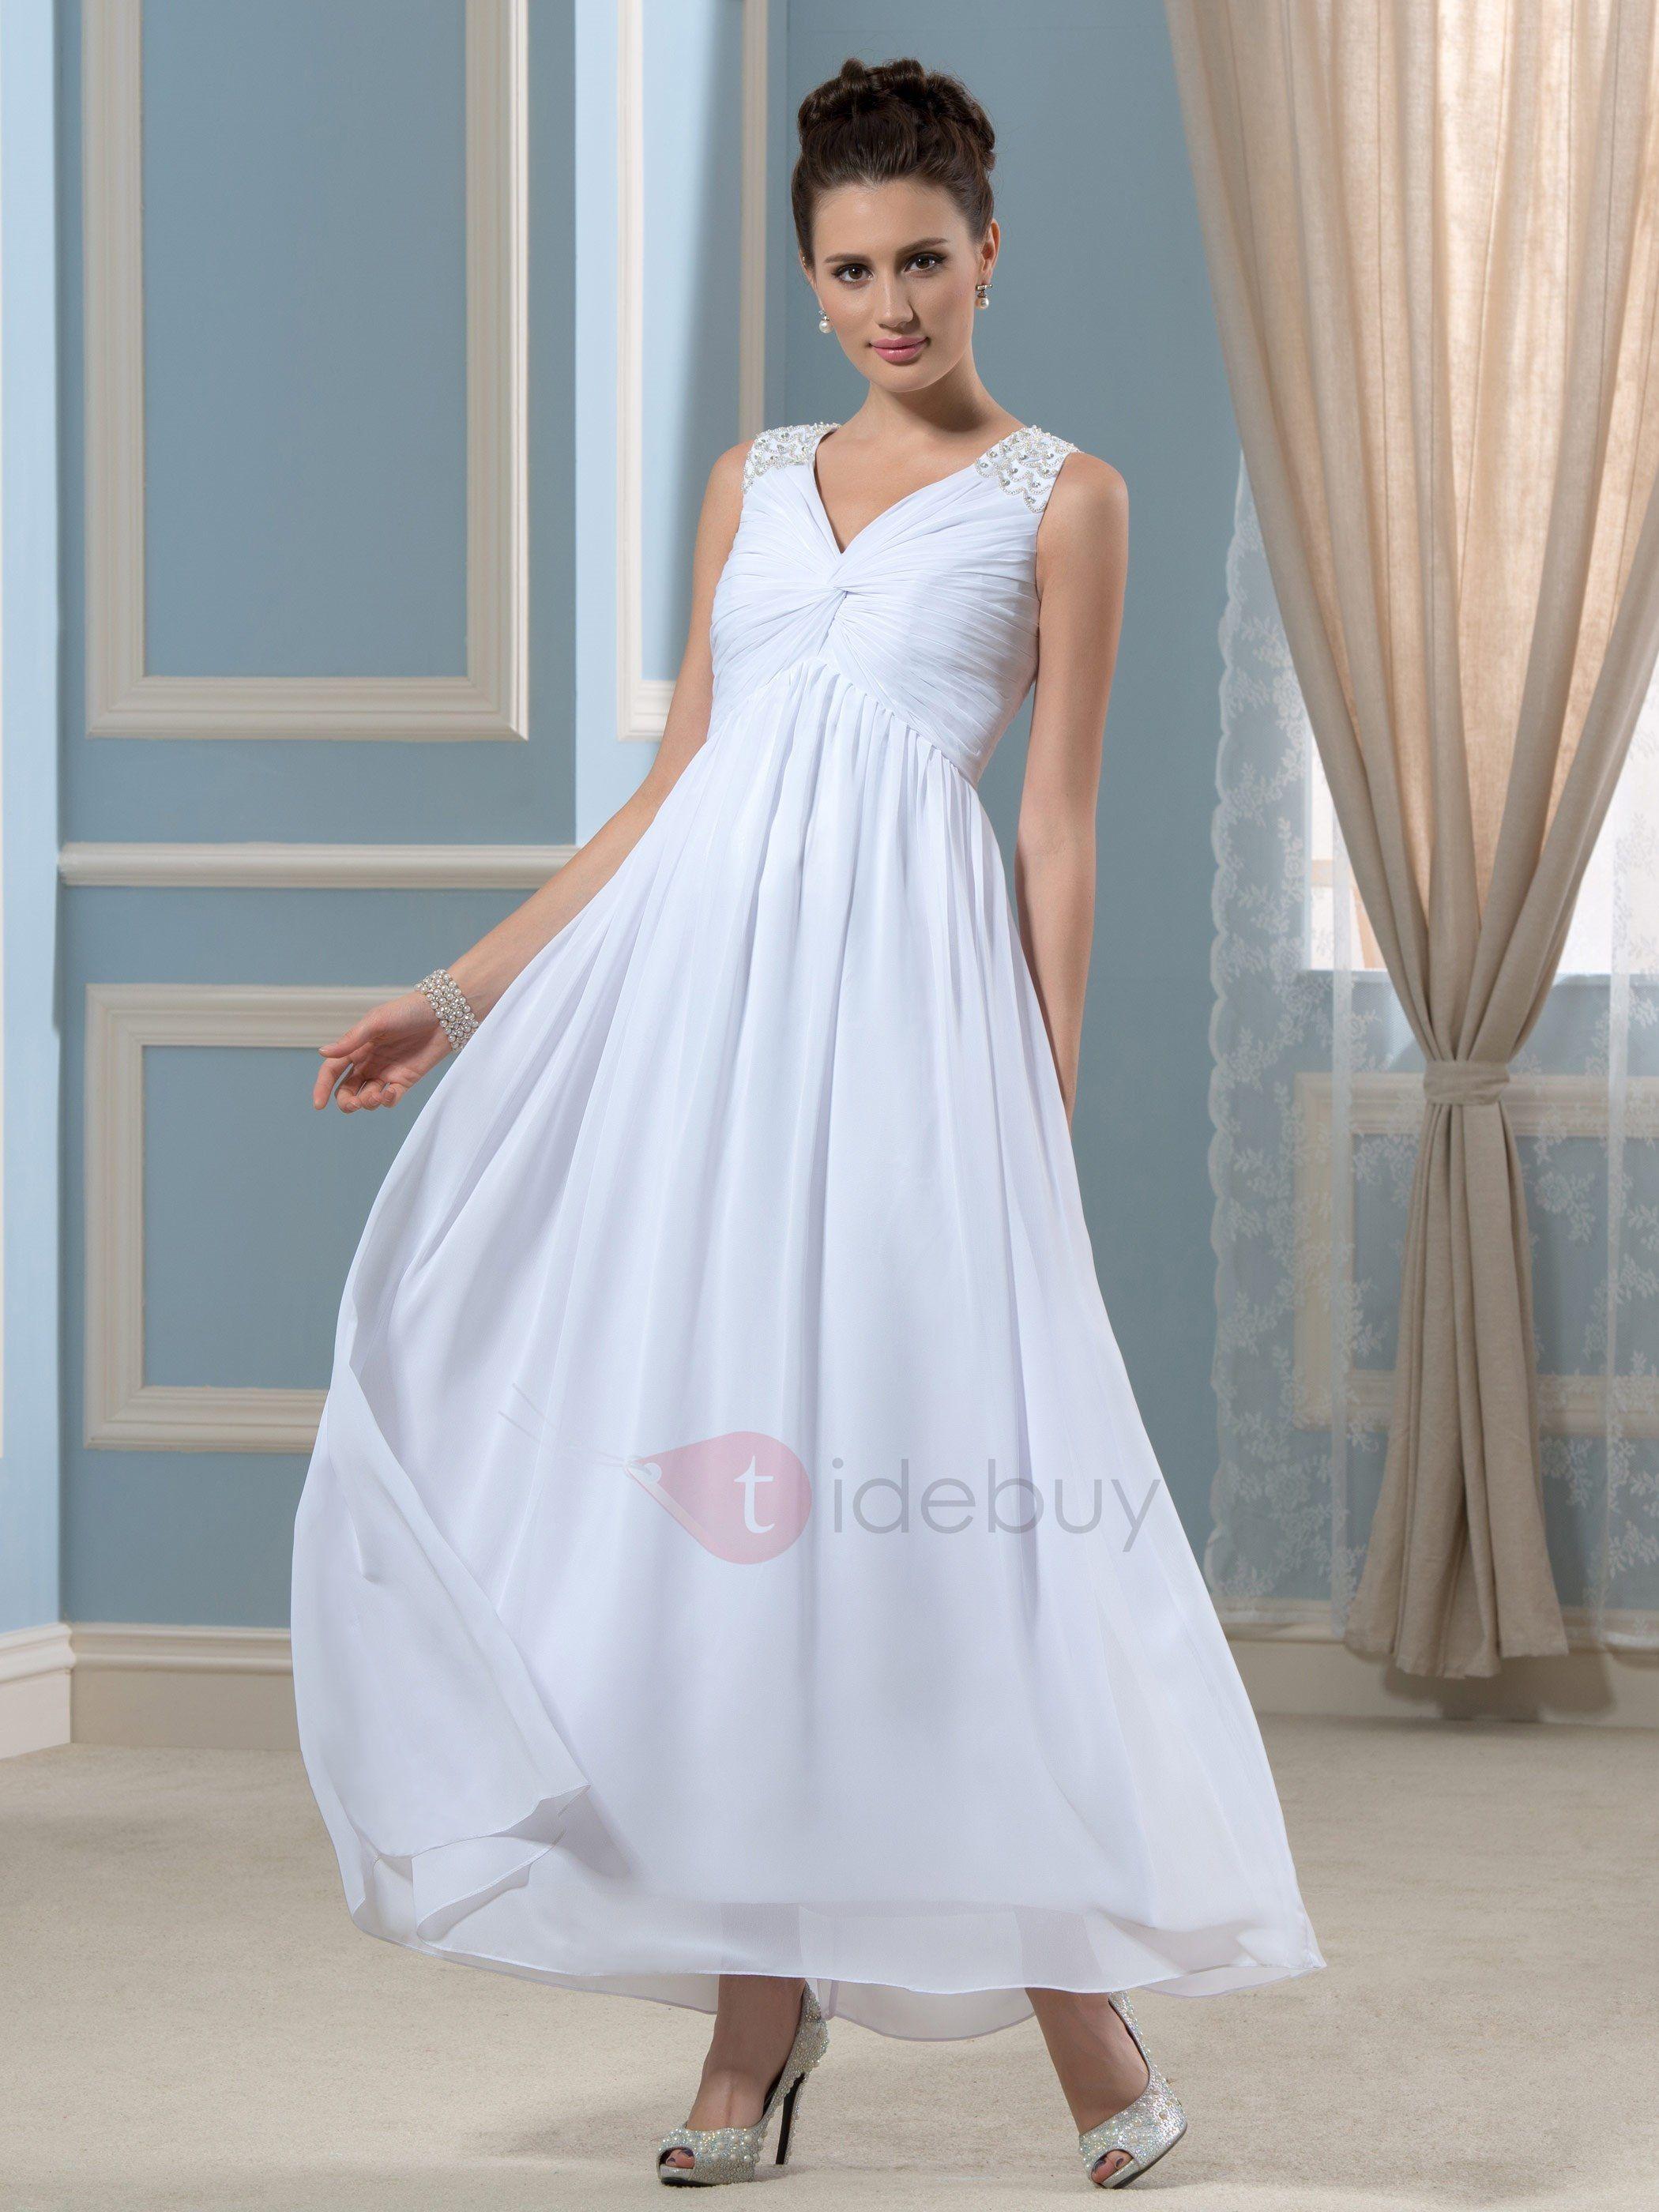 Simple Beaded Ankle Length Wedding Dress Ankle Length Wedding Dress Embellished Wedding Dress Chiffon Wedding Dress Beach [ 2800 x 2100 Pixel ]